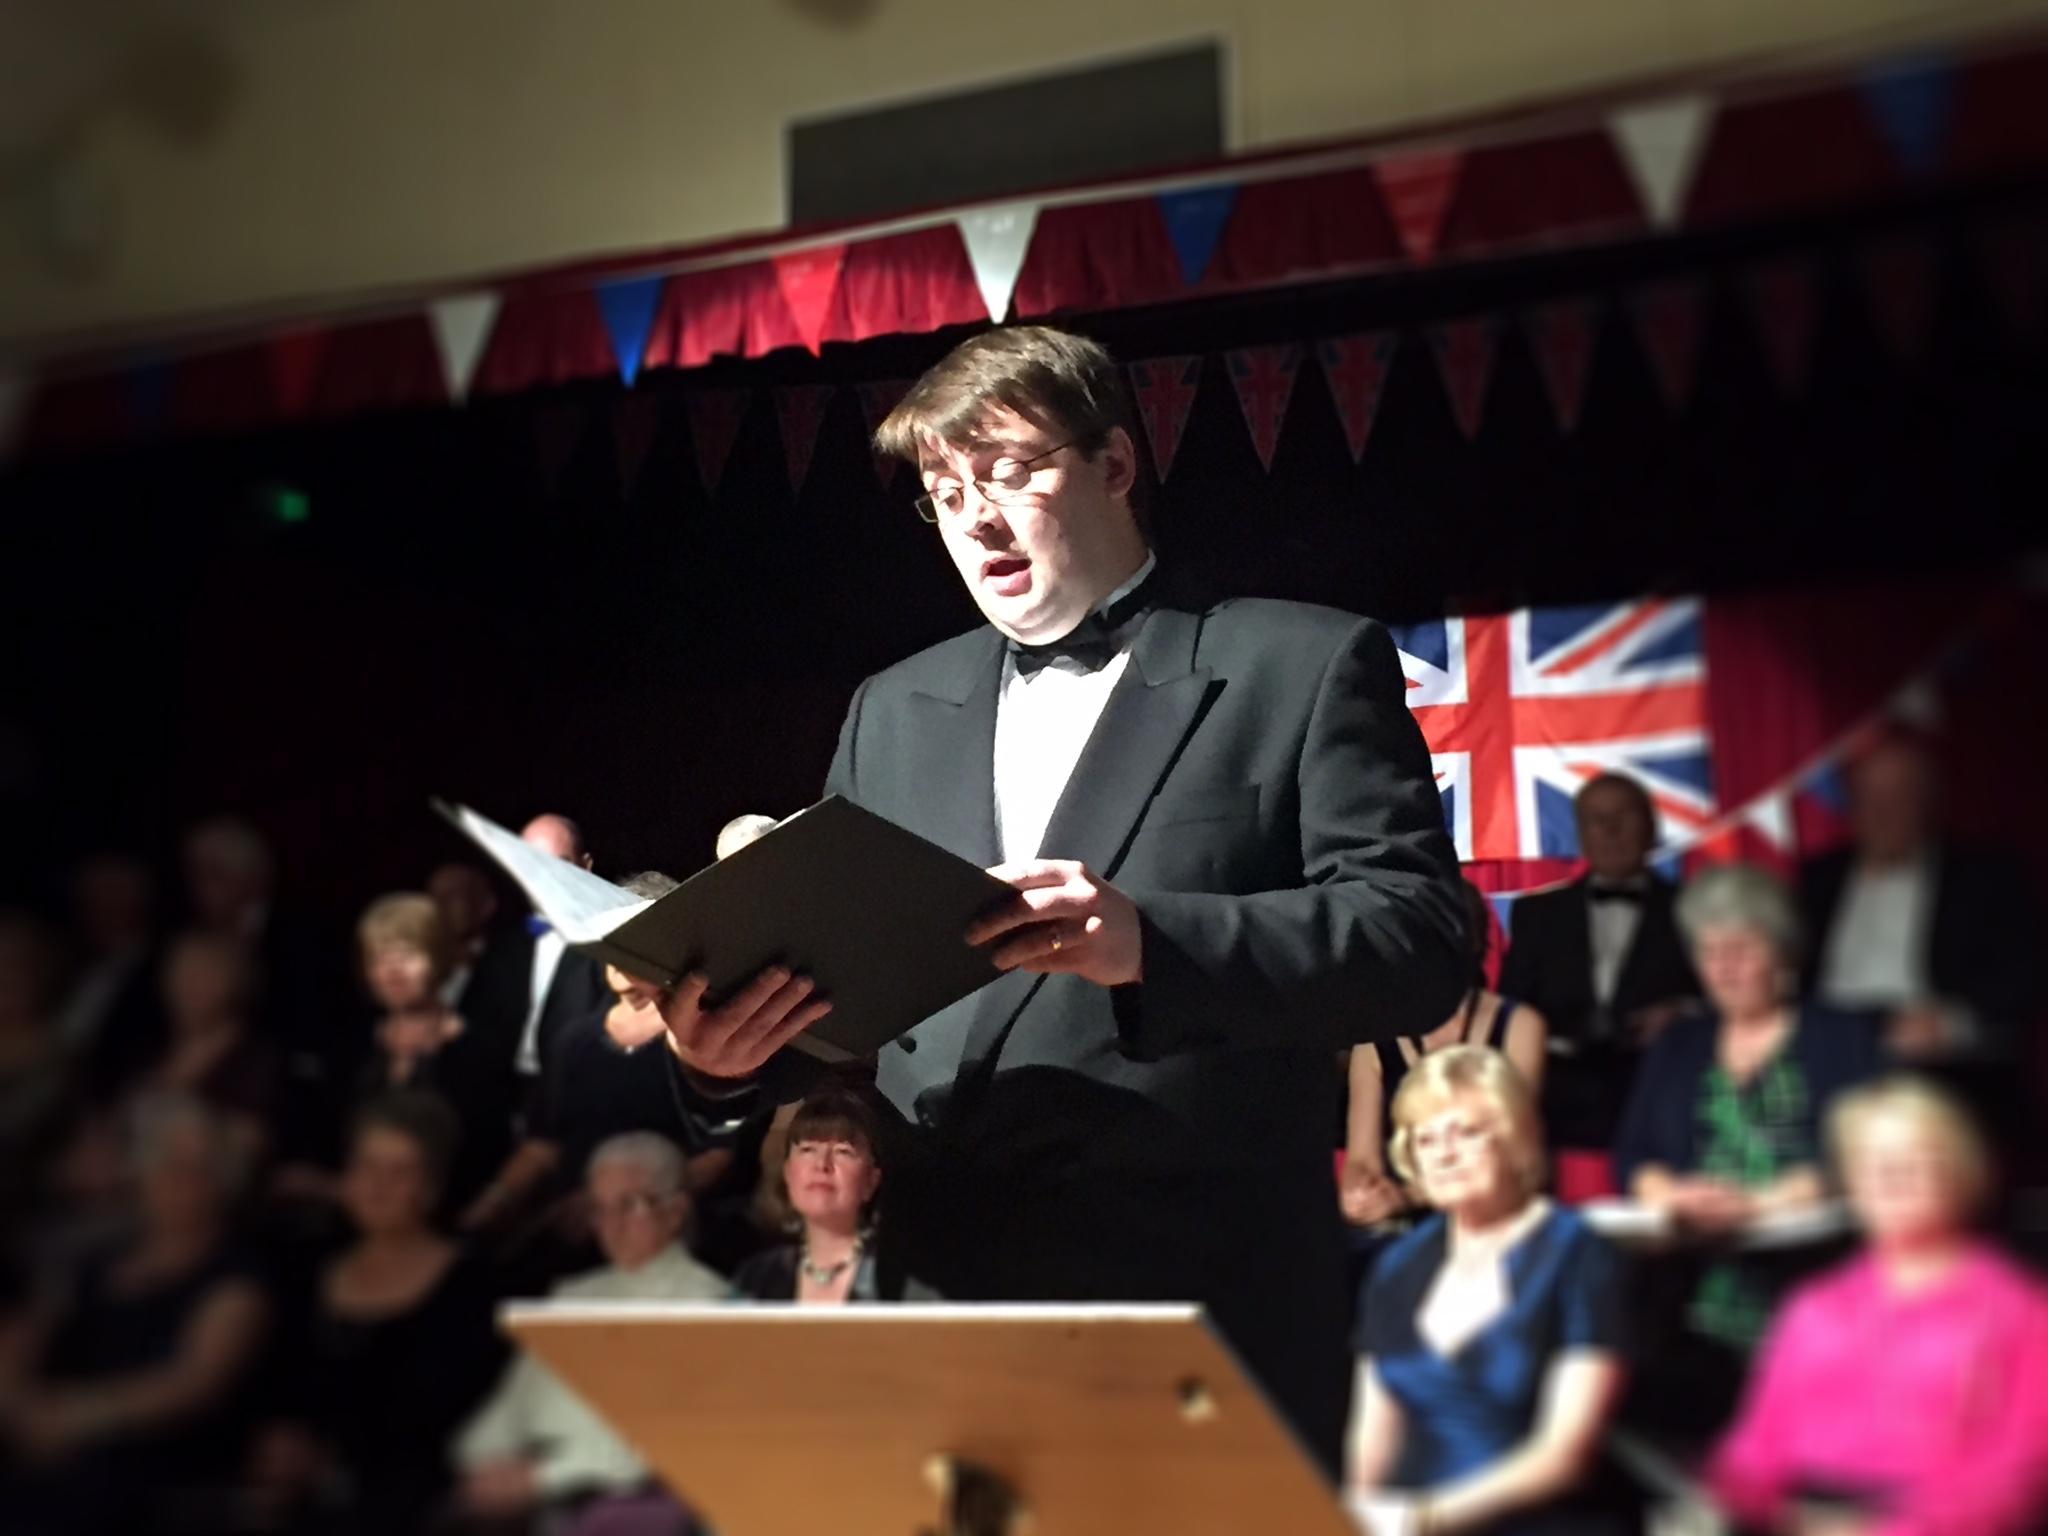 Howard Feather sings Nessun Dorma